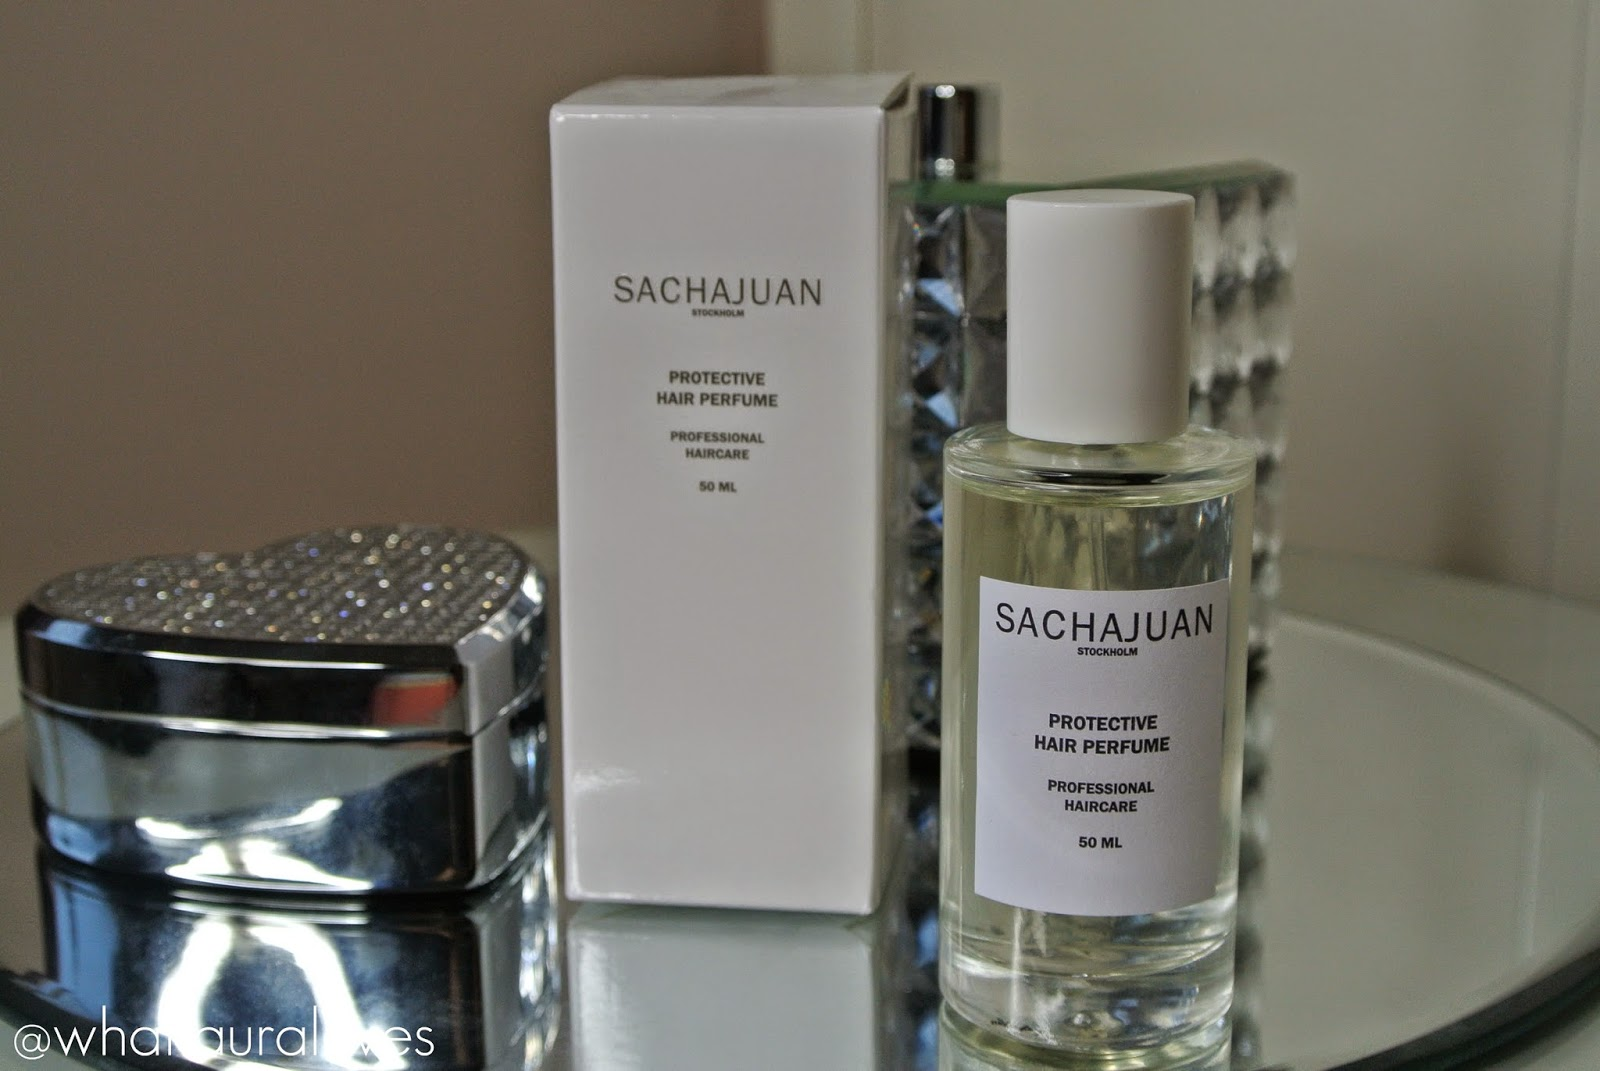 Sachajuan Protective Hair Perfume Review Image